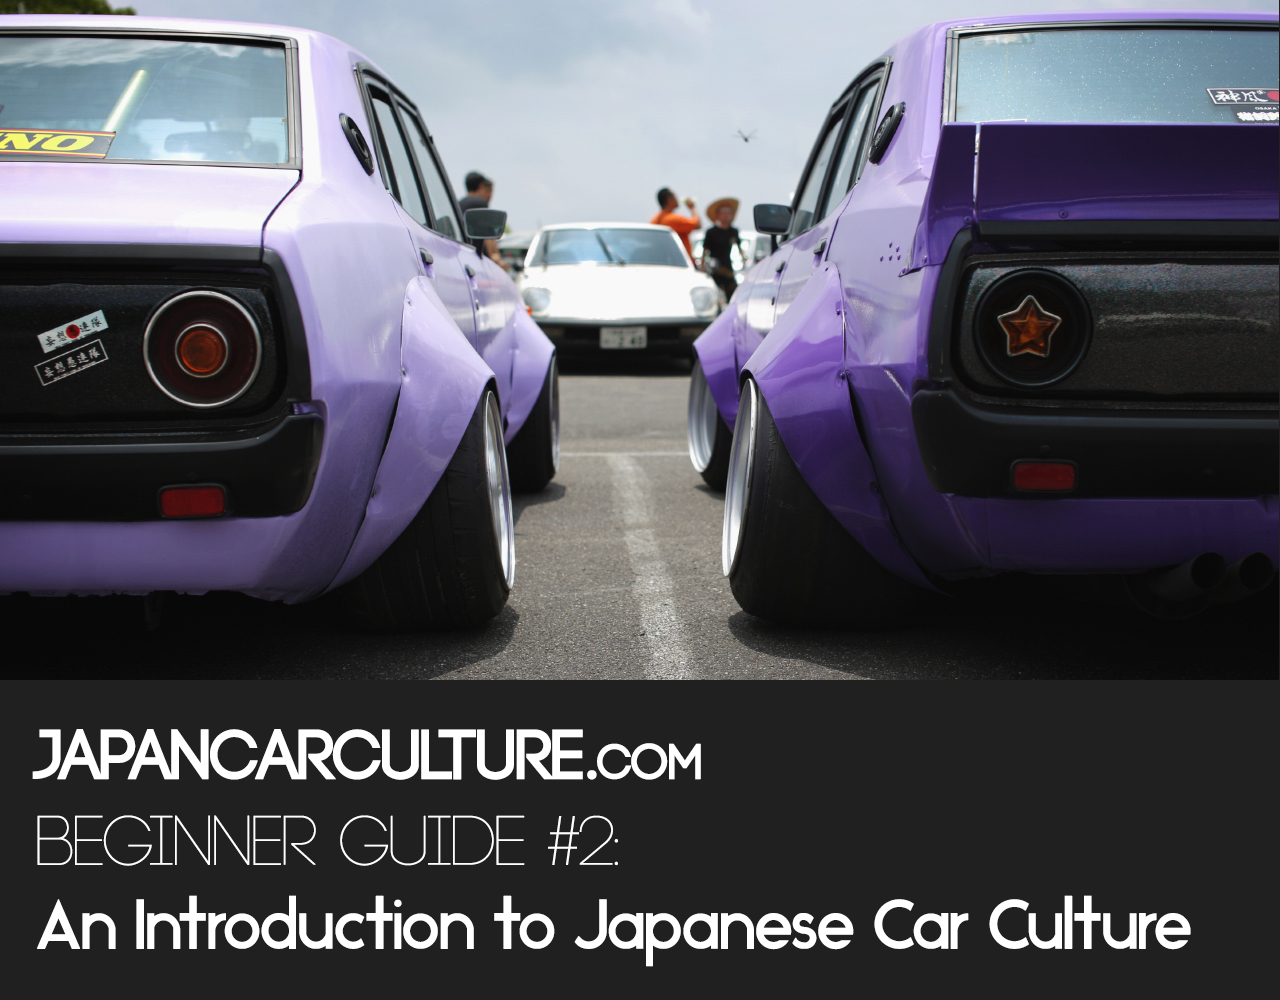 AnIntrotoJapaneseCarCultureCoverConcept.jpg